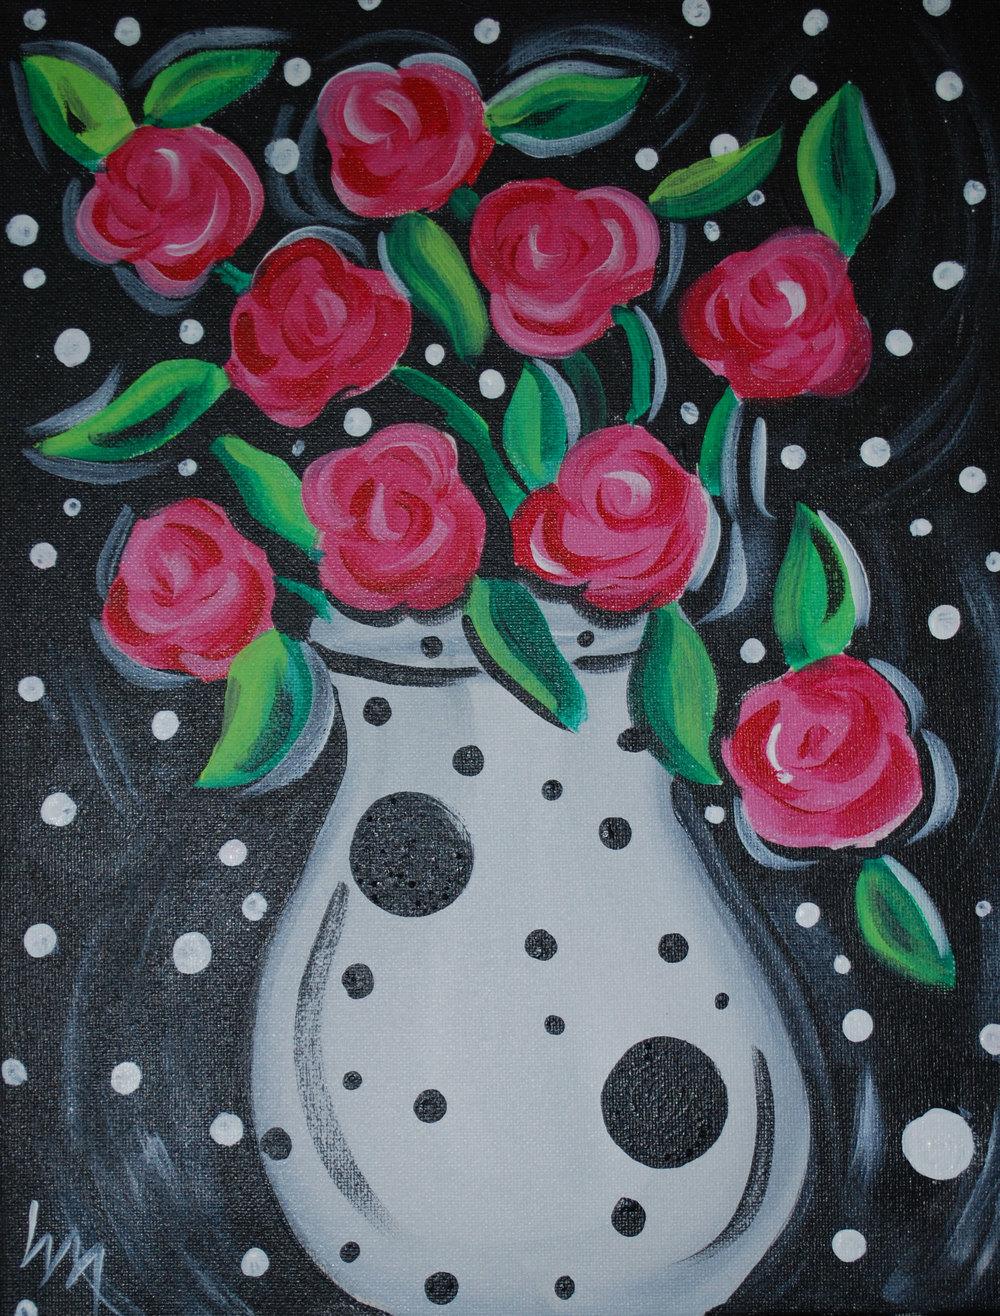 vase-of-roses.jpg